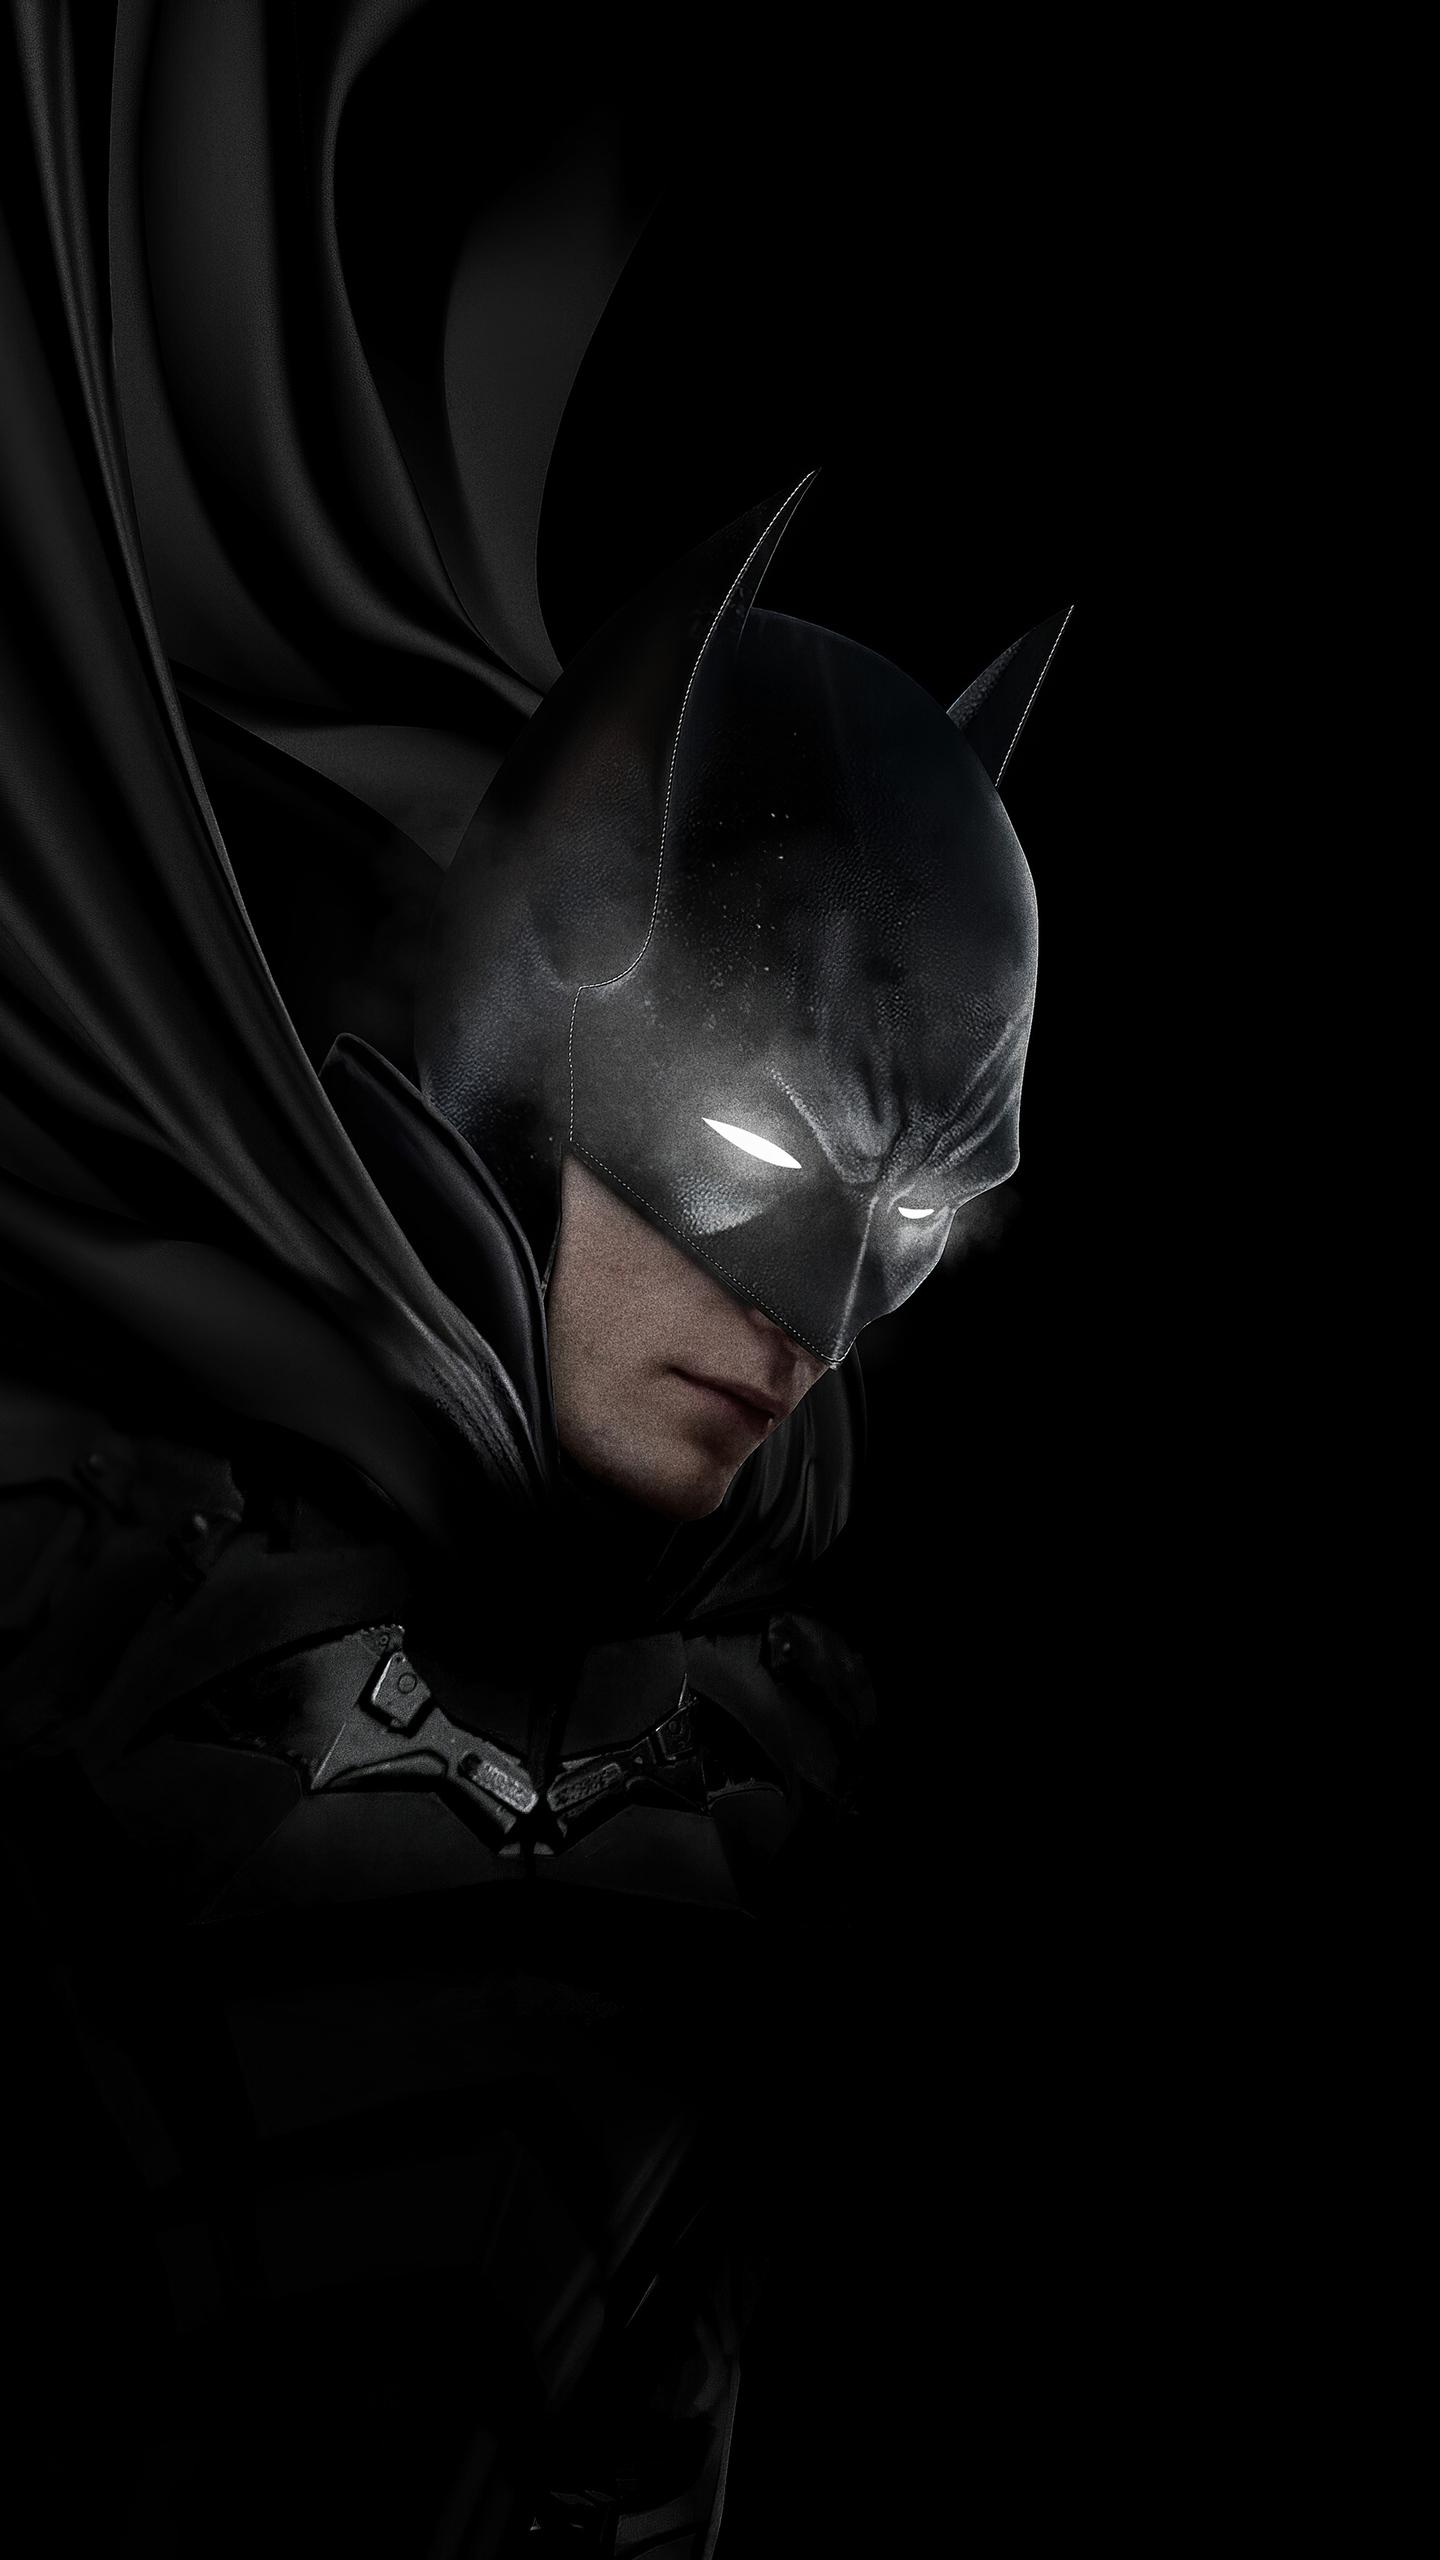 batman-robert-pattinson-4k-artwork-2r.jpg